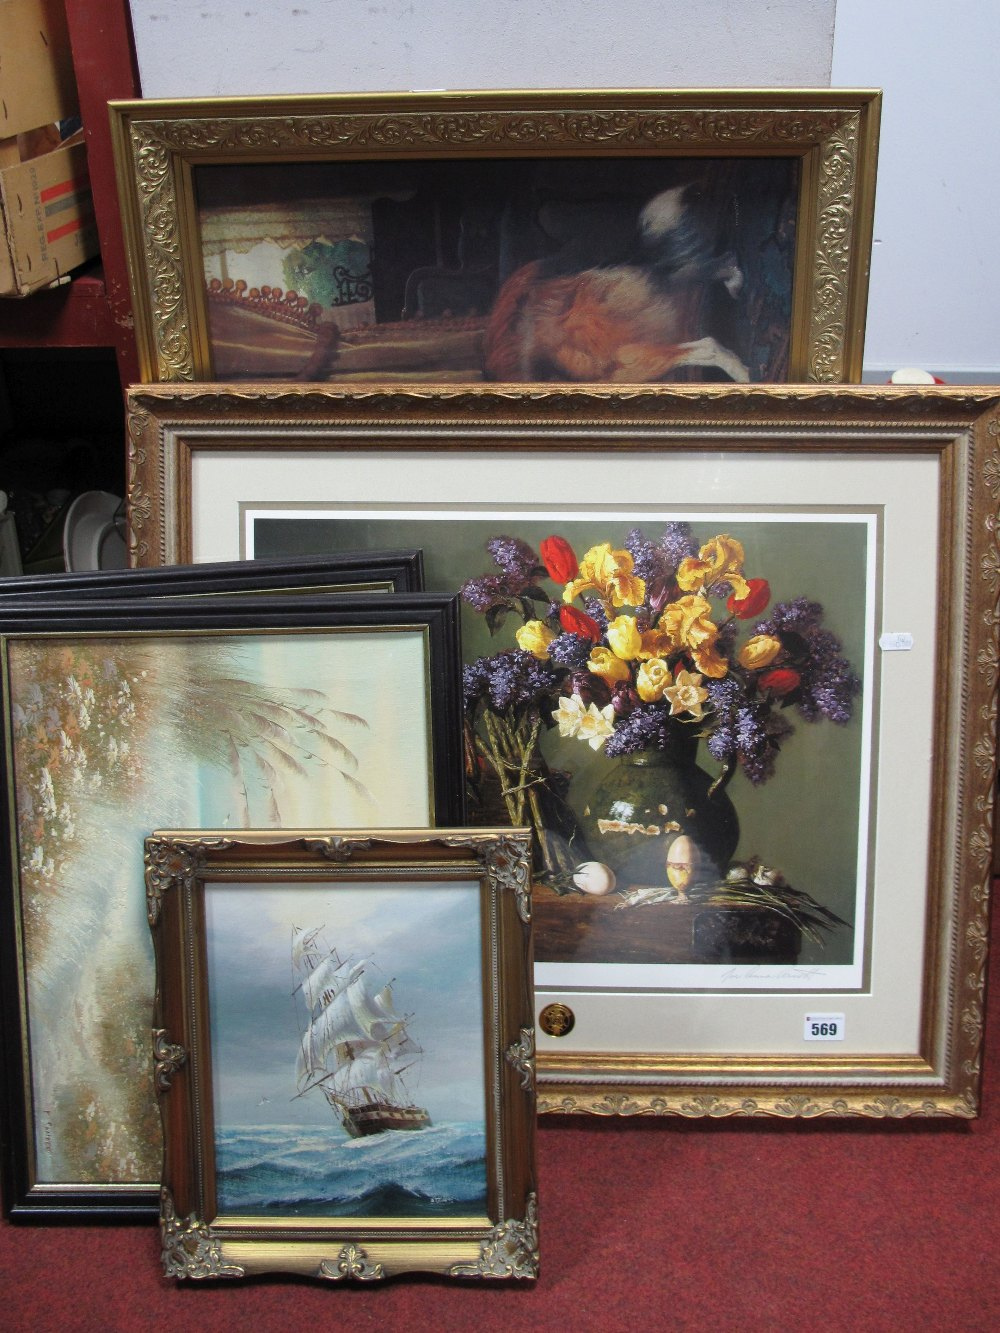 Lot 569 - J. David, Clipper Ship, oil on canvas, 24 x 19cm, signed lower left; two coastal scene oils; Joe